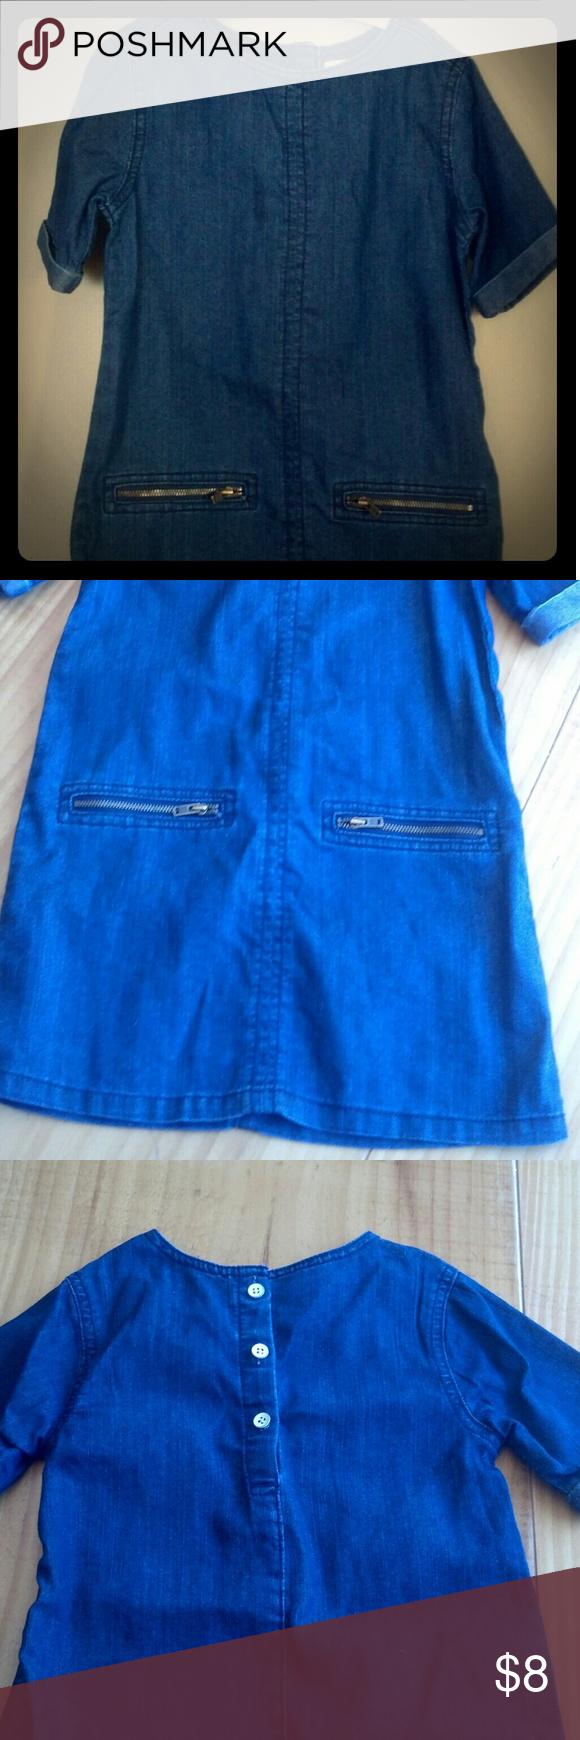 Denim short sleeve dress EUC denim dress with zipper pockets Old Navy Dresses Casual